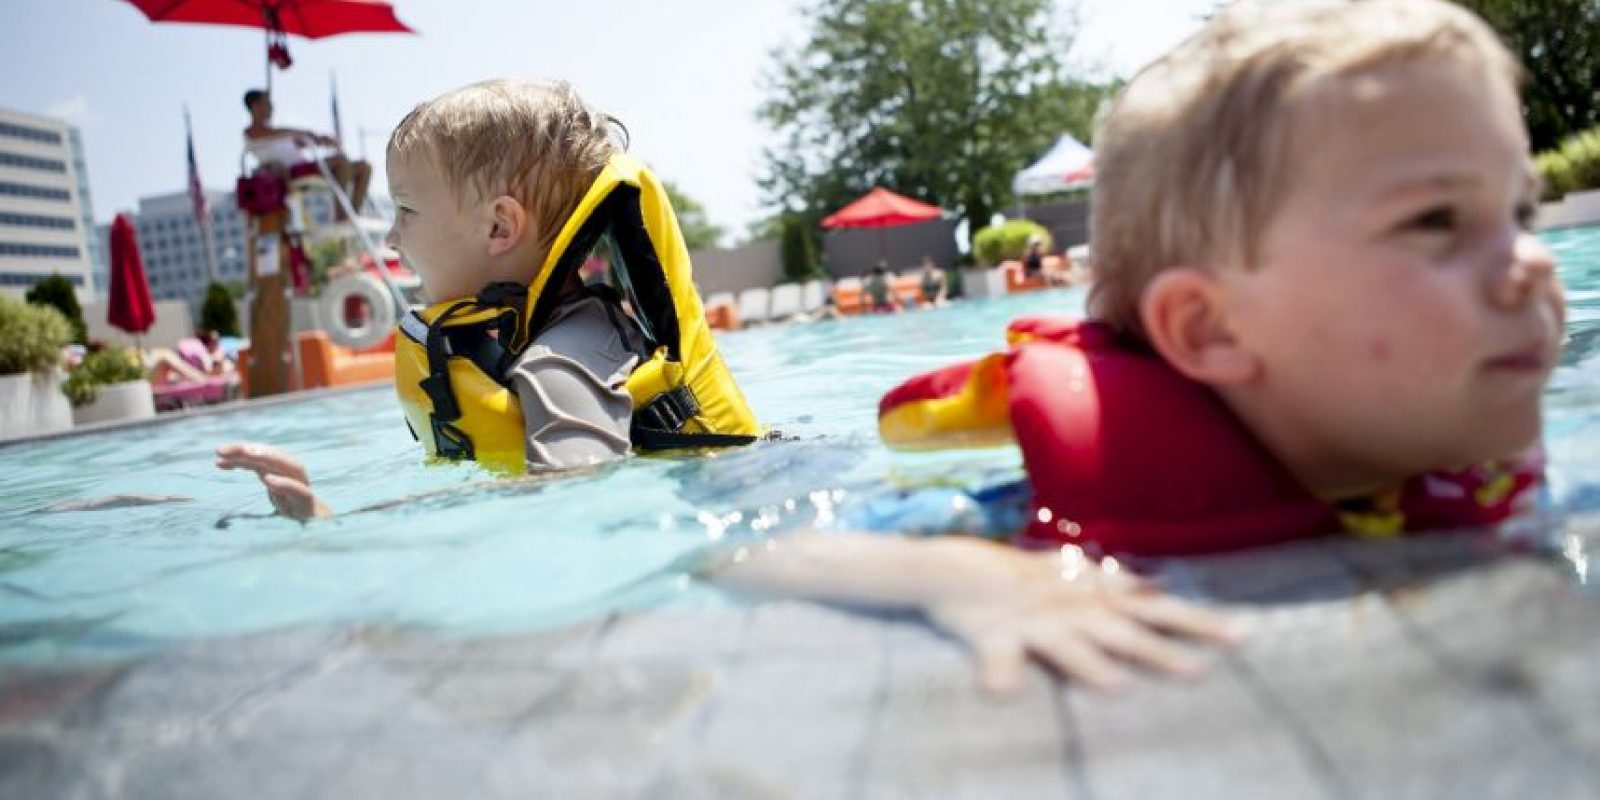 Podemos pedirle que lance juguetes al agua para que vea cómo flotan. Foto:Getty Images